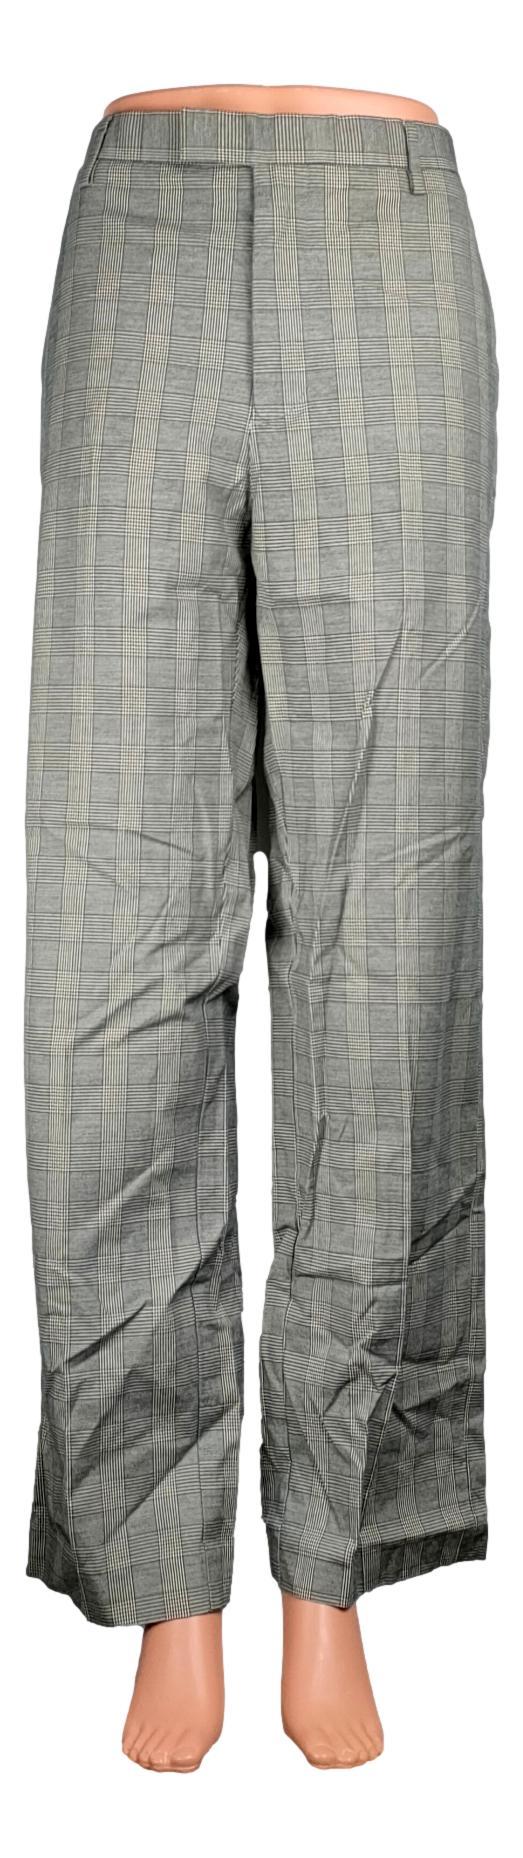 Pantalon Dockers - Taille 44